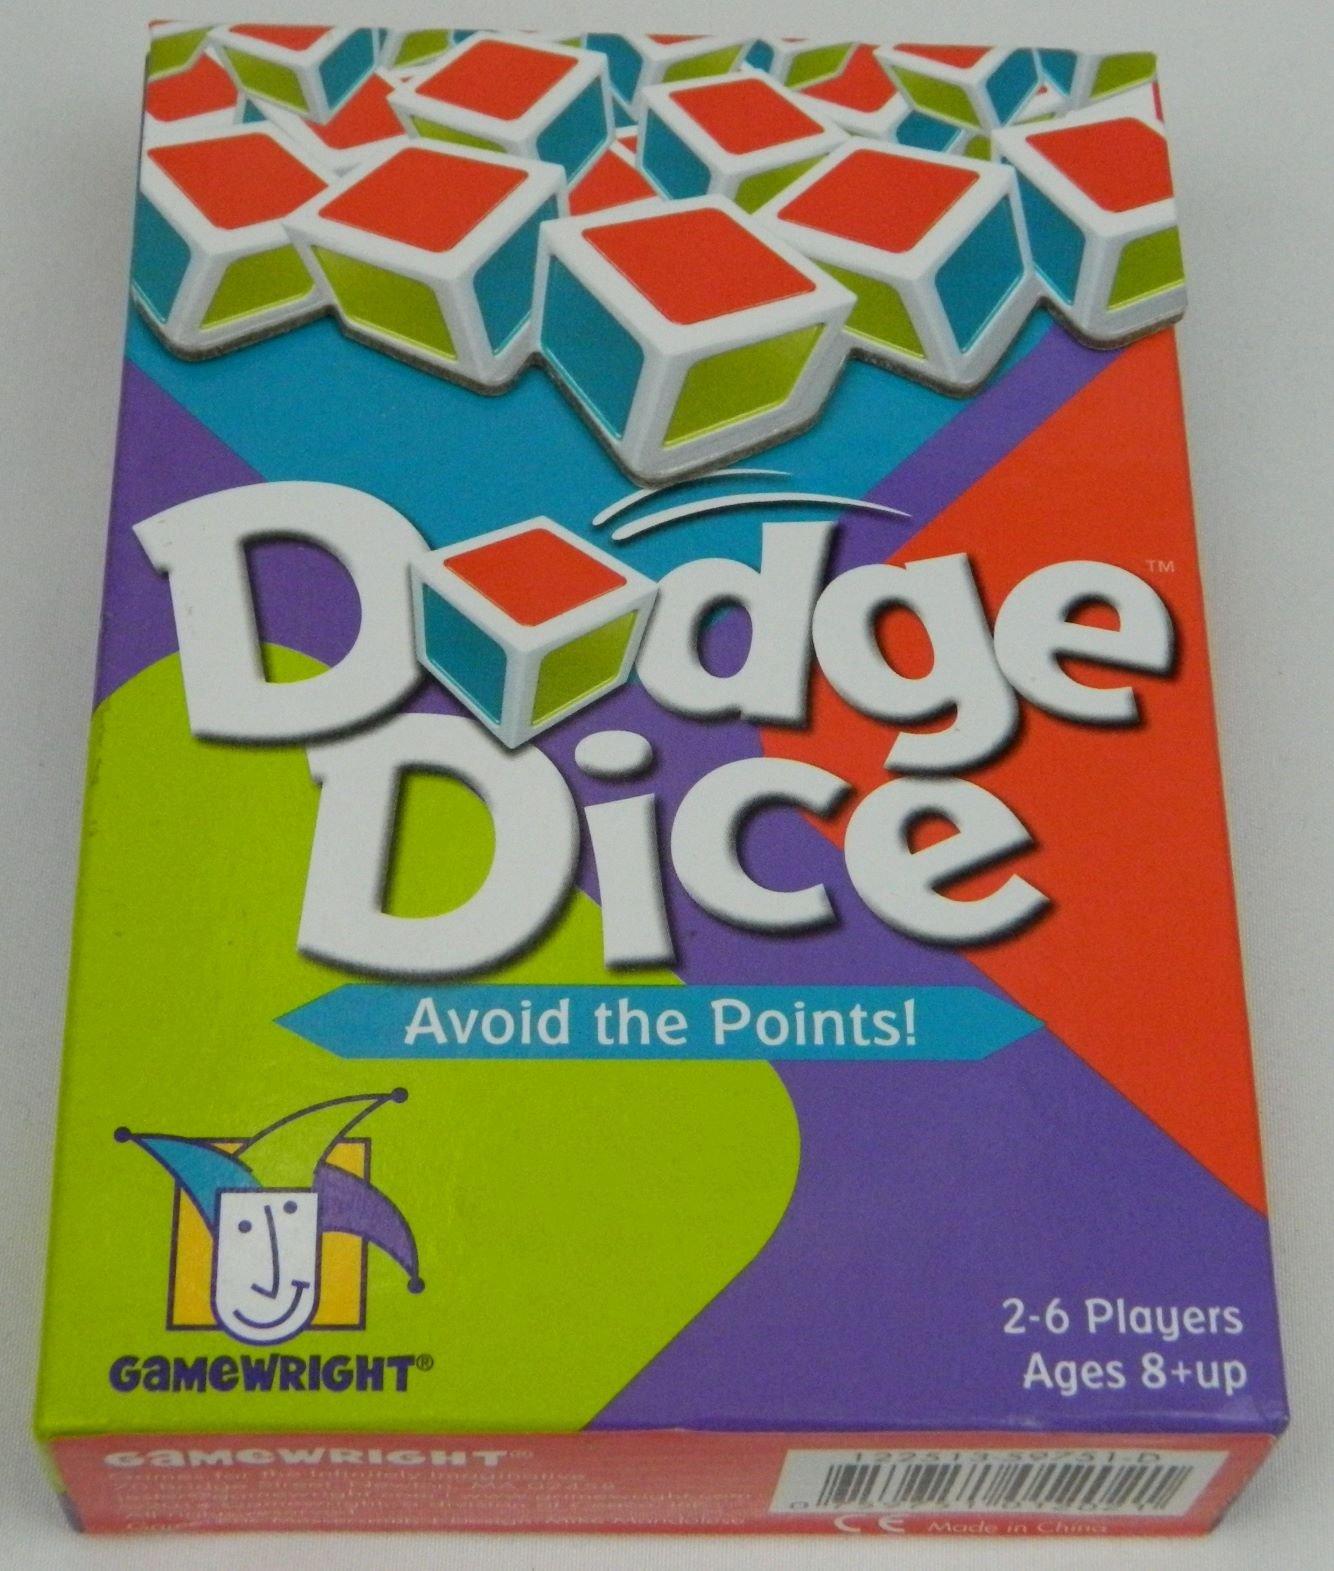 Box for Dodge Dice